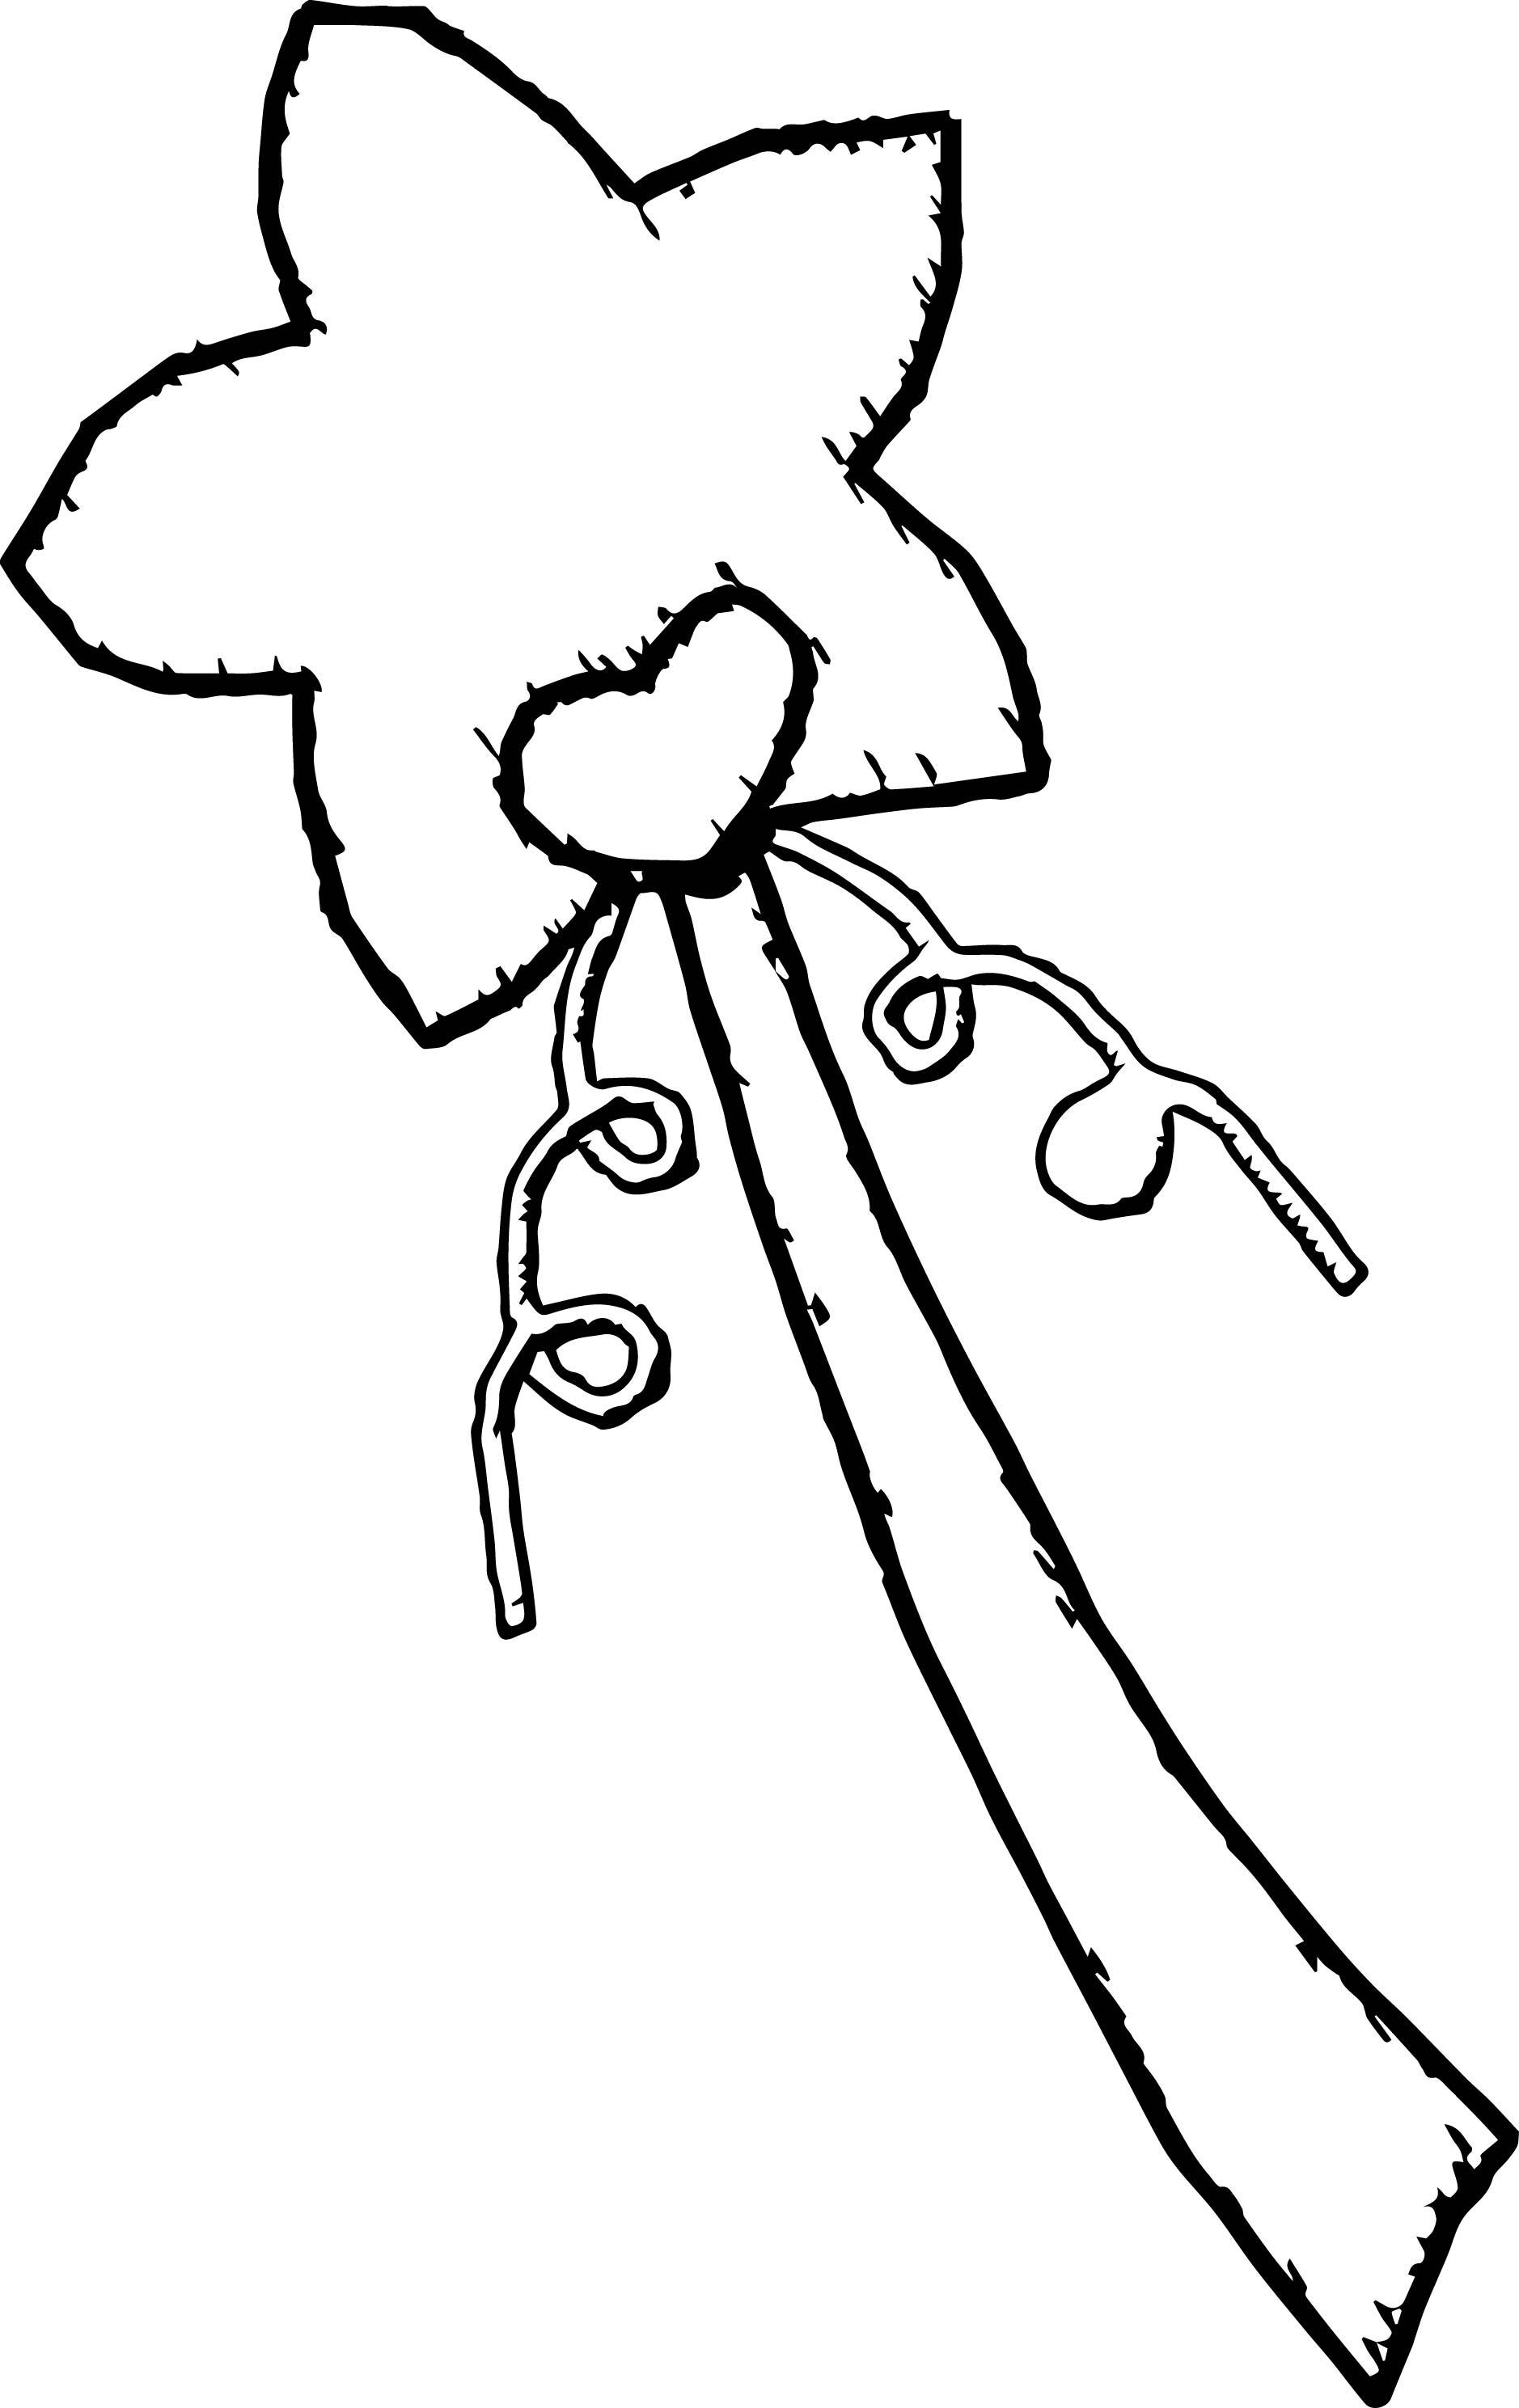 Prince Wand: Princess Wand Coloring Page